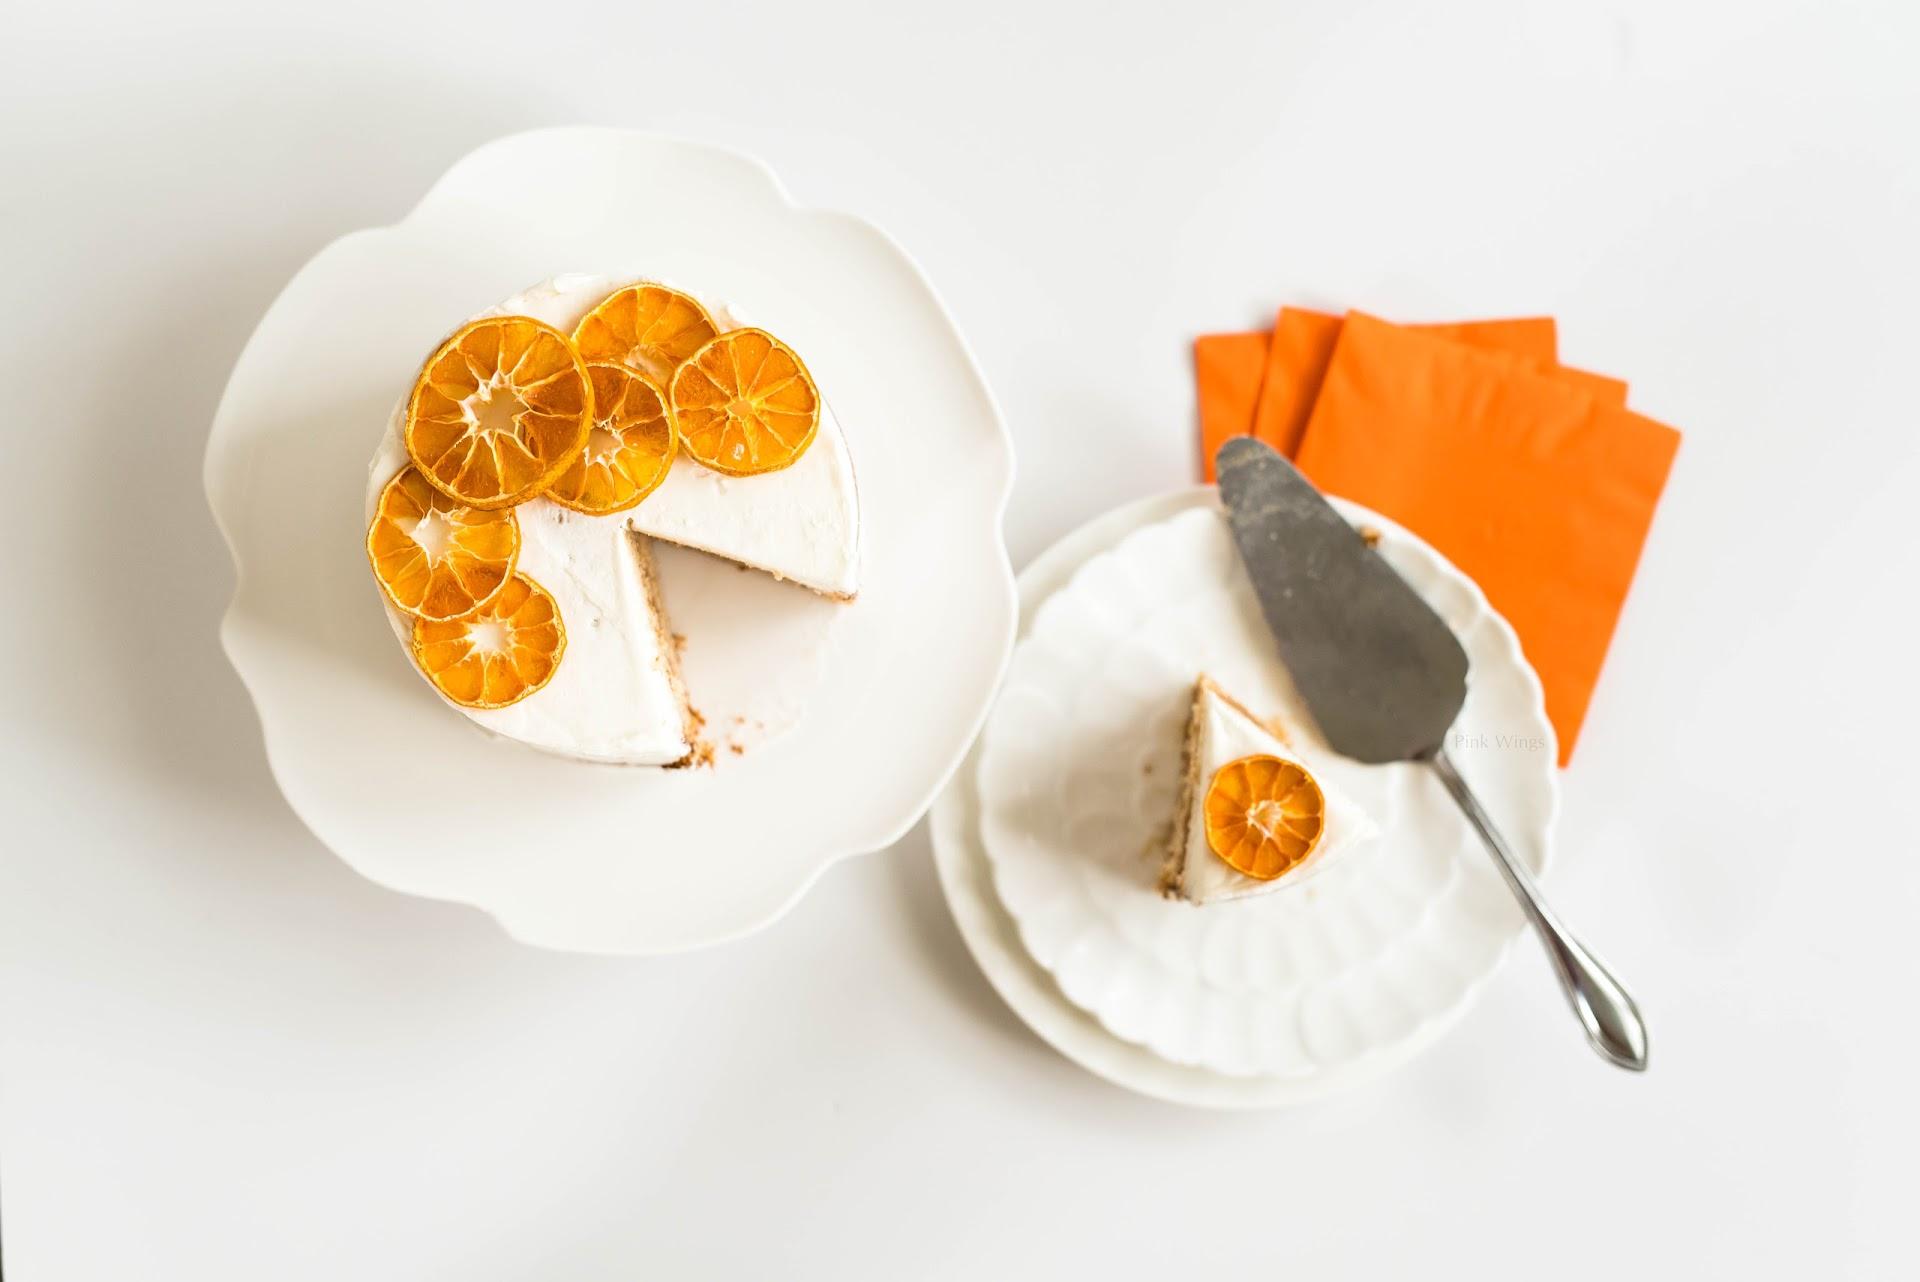 blood orange dessert, orange cake, summer cake, holiday cake, winter fall autumn cake, fruit in season, candied oranges, mini layered cake, 6 inch cake, san francisco food blogger, bay area, california, lds mormon, small cake for couples, baking for husband boyfriend hubby, spouse, holiday dessert, christmas dessert, asian korean japanese baker blogger